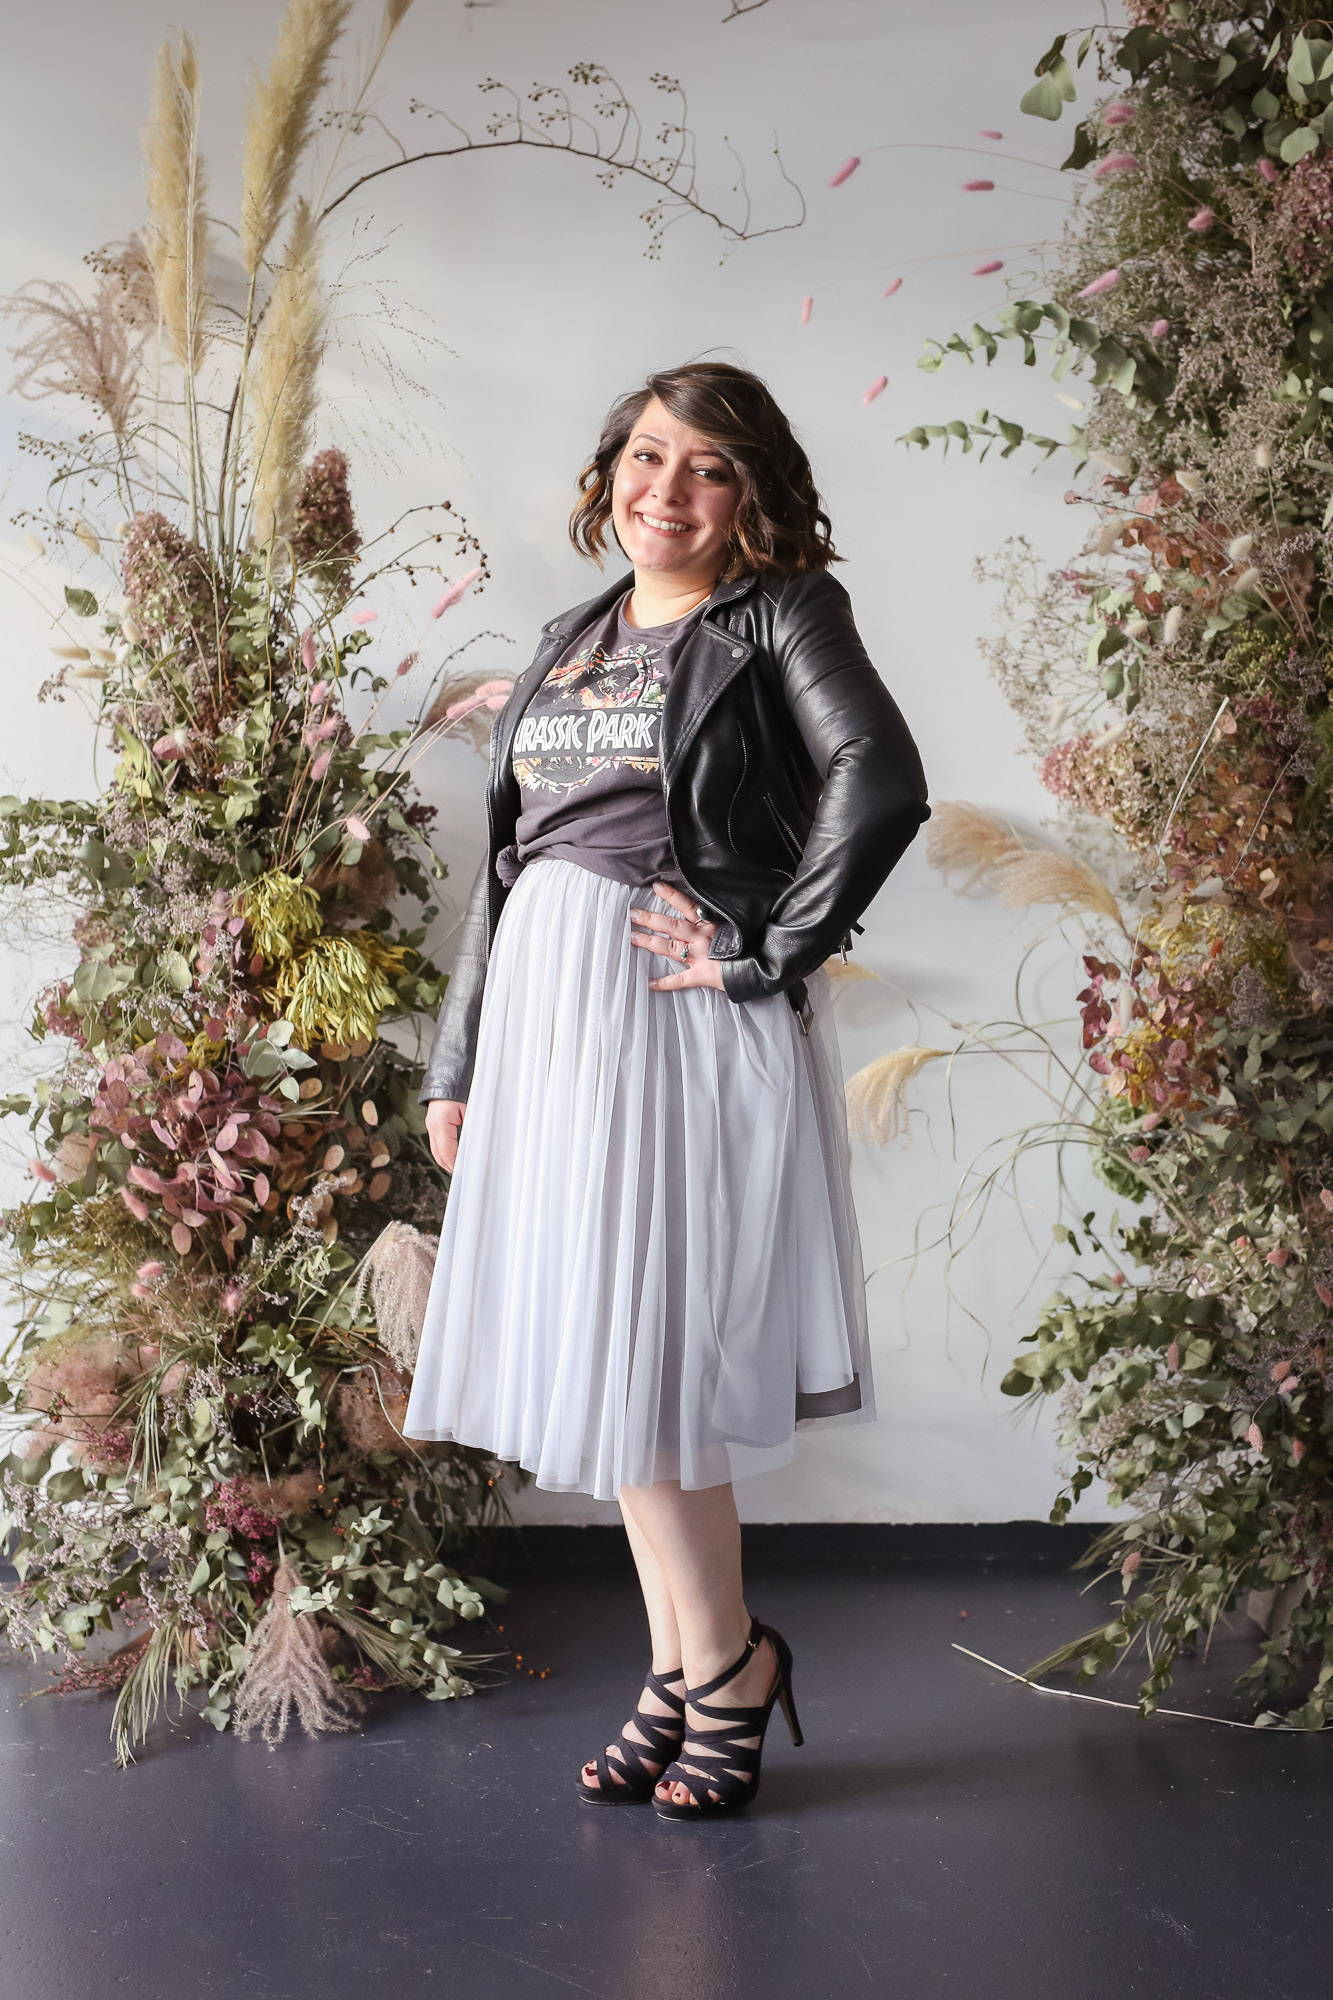 noni Brautmode, Styling Inspiration, kurzer Brautrock in grau mit Lederjacke und T-Shirt